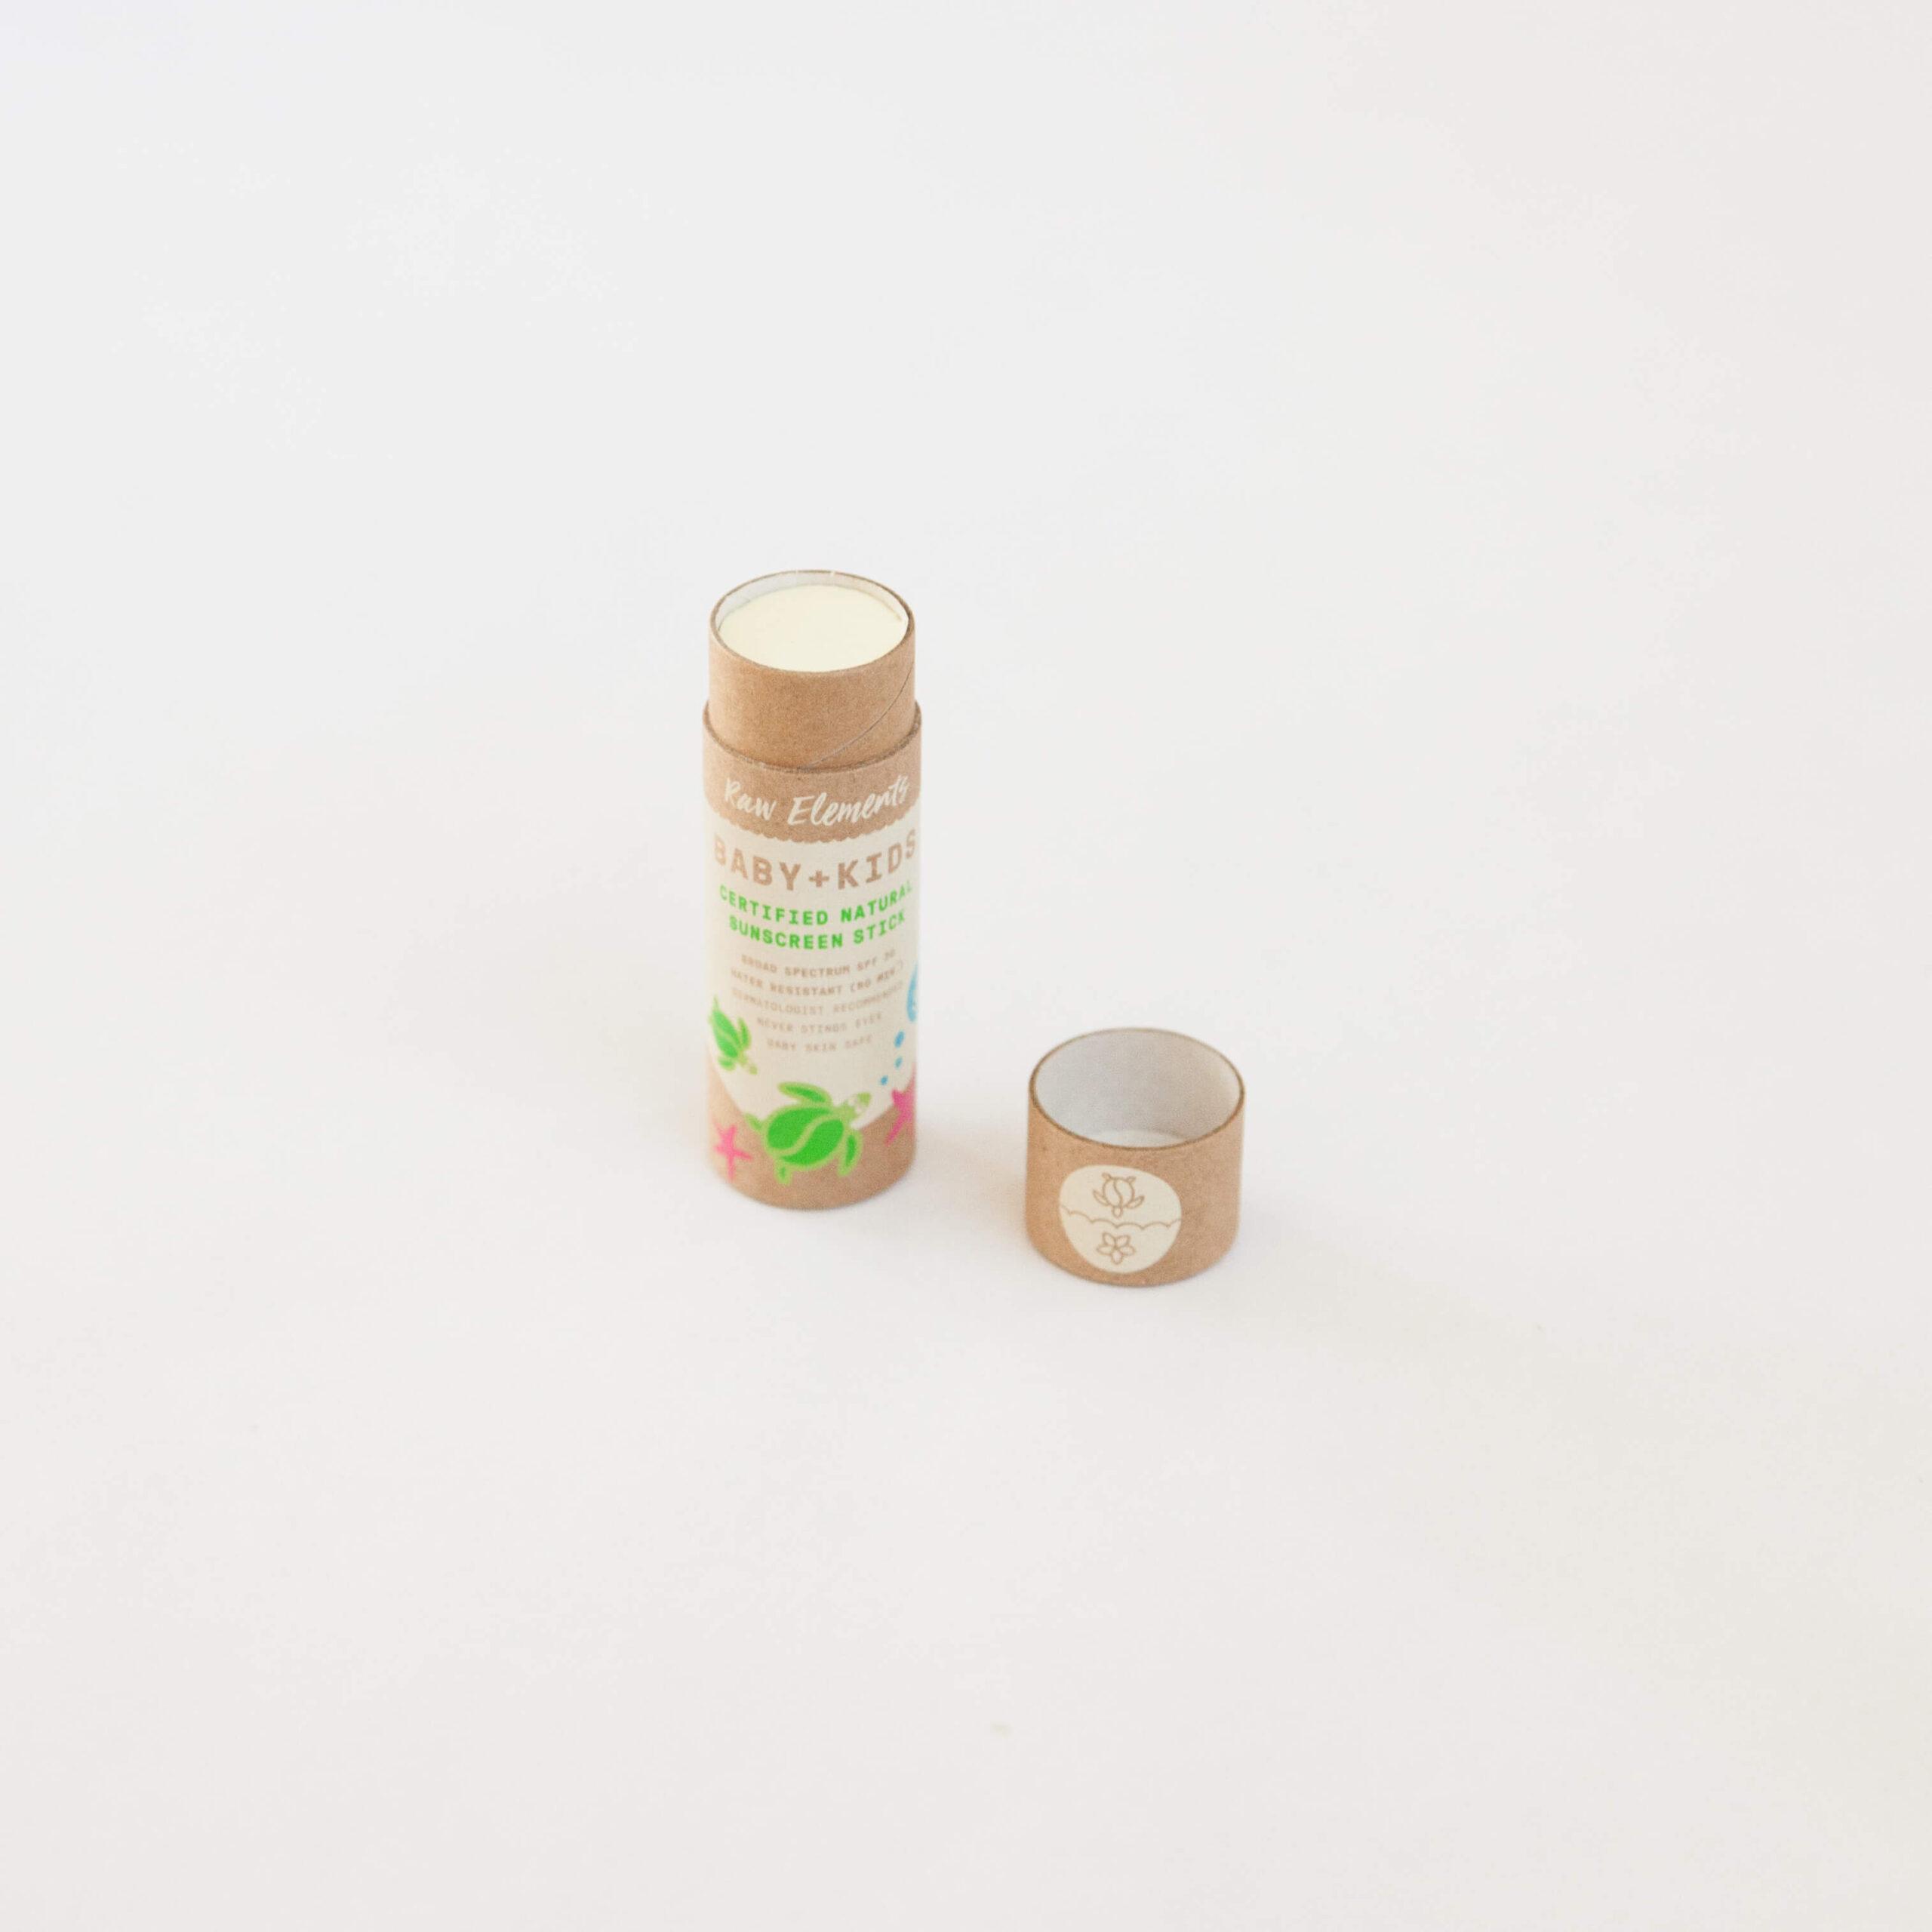 Baby + Kids Sunscreen Stick